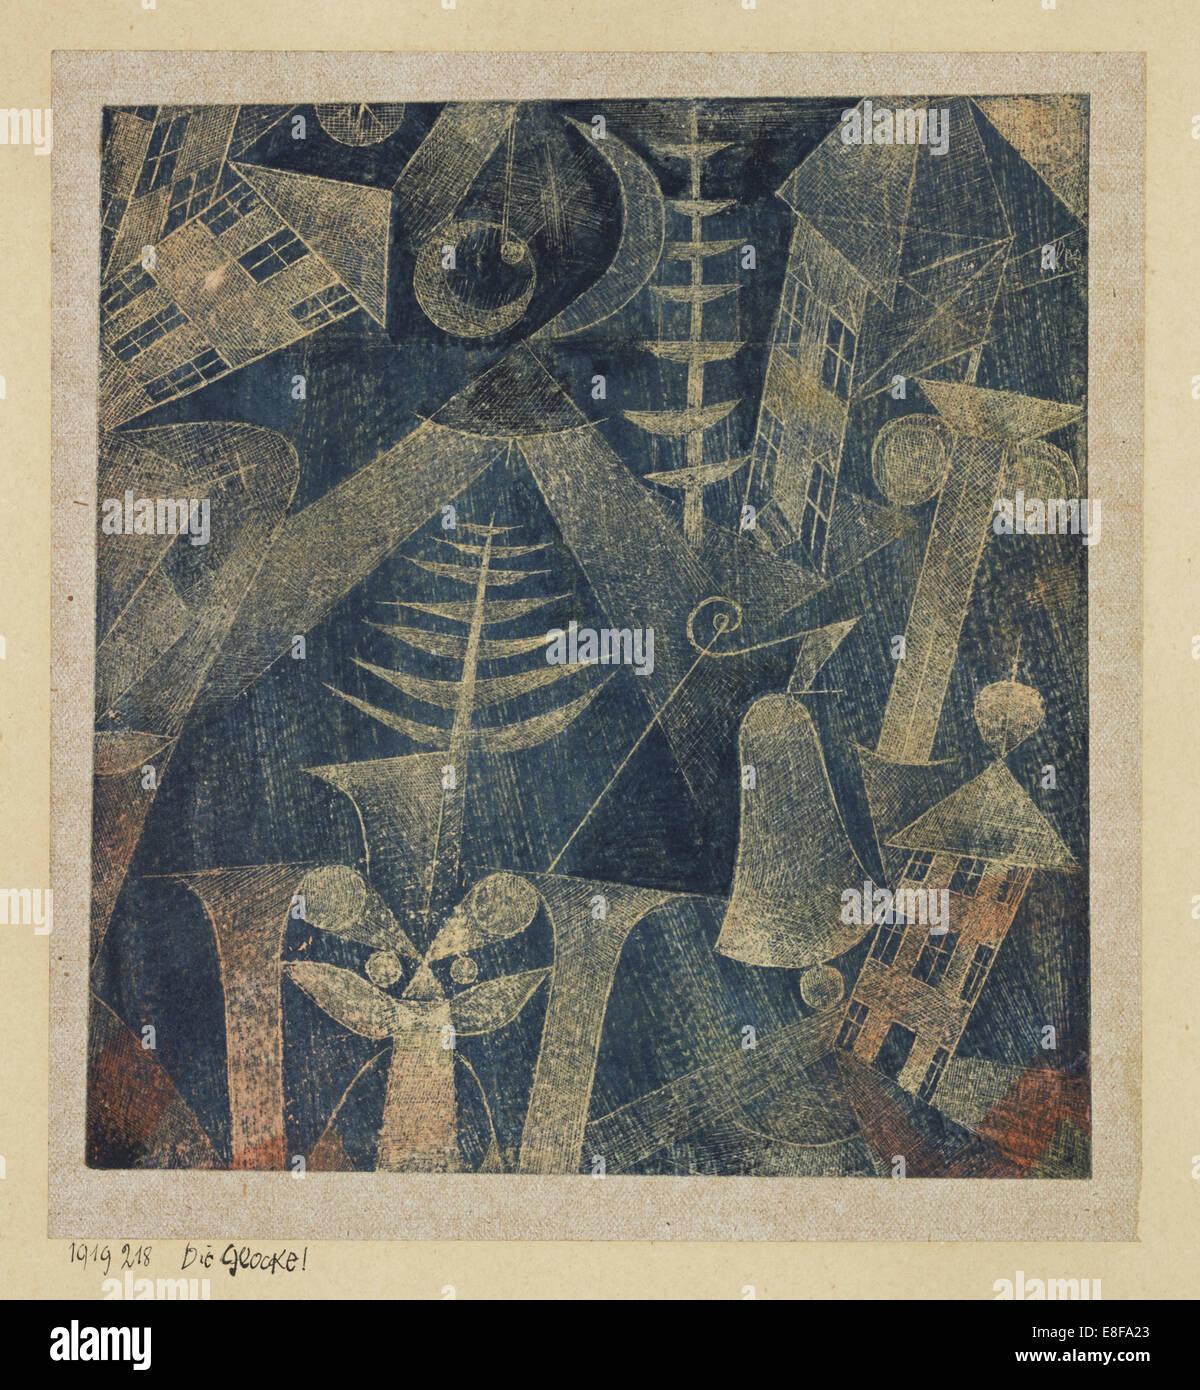 The bell!. Artist: Klee, Paul (1879-1940) - Stock Image